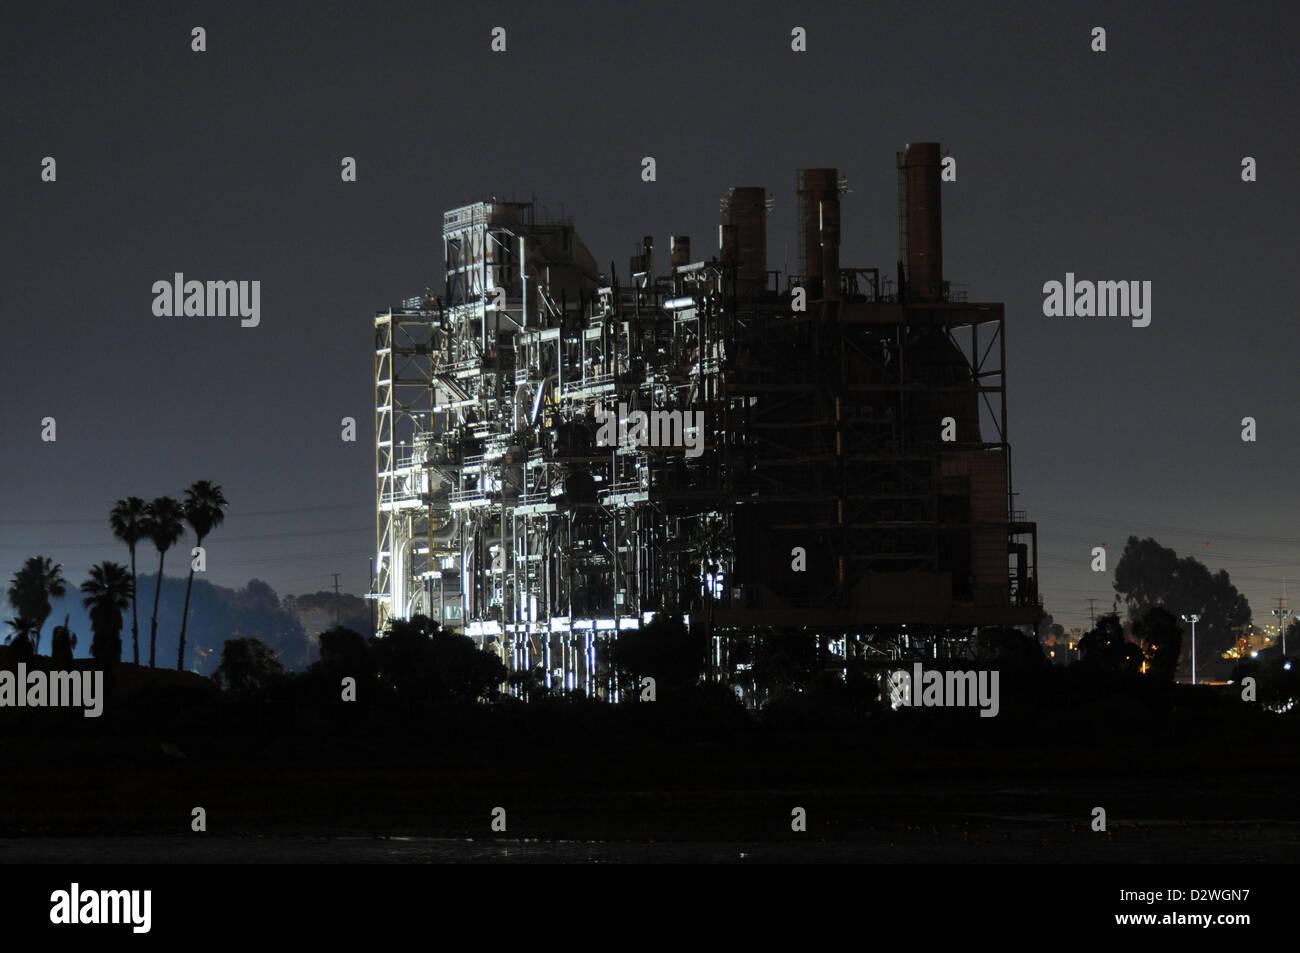 Feb. 2, 2013 - California, U.S. - The Southbay Power Plant, a ...